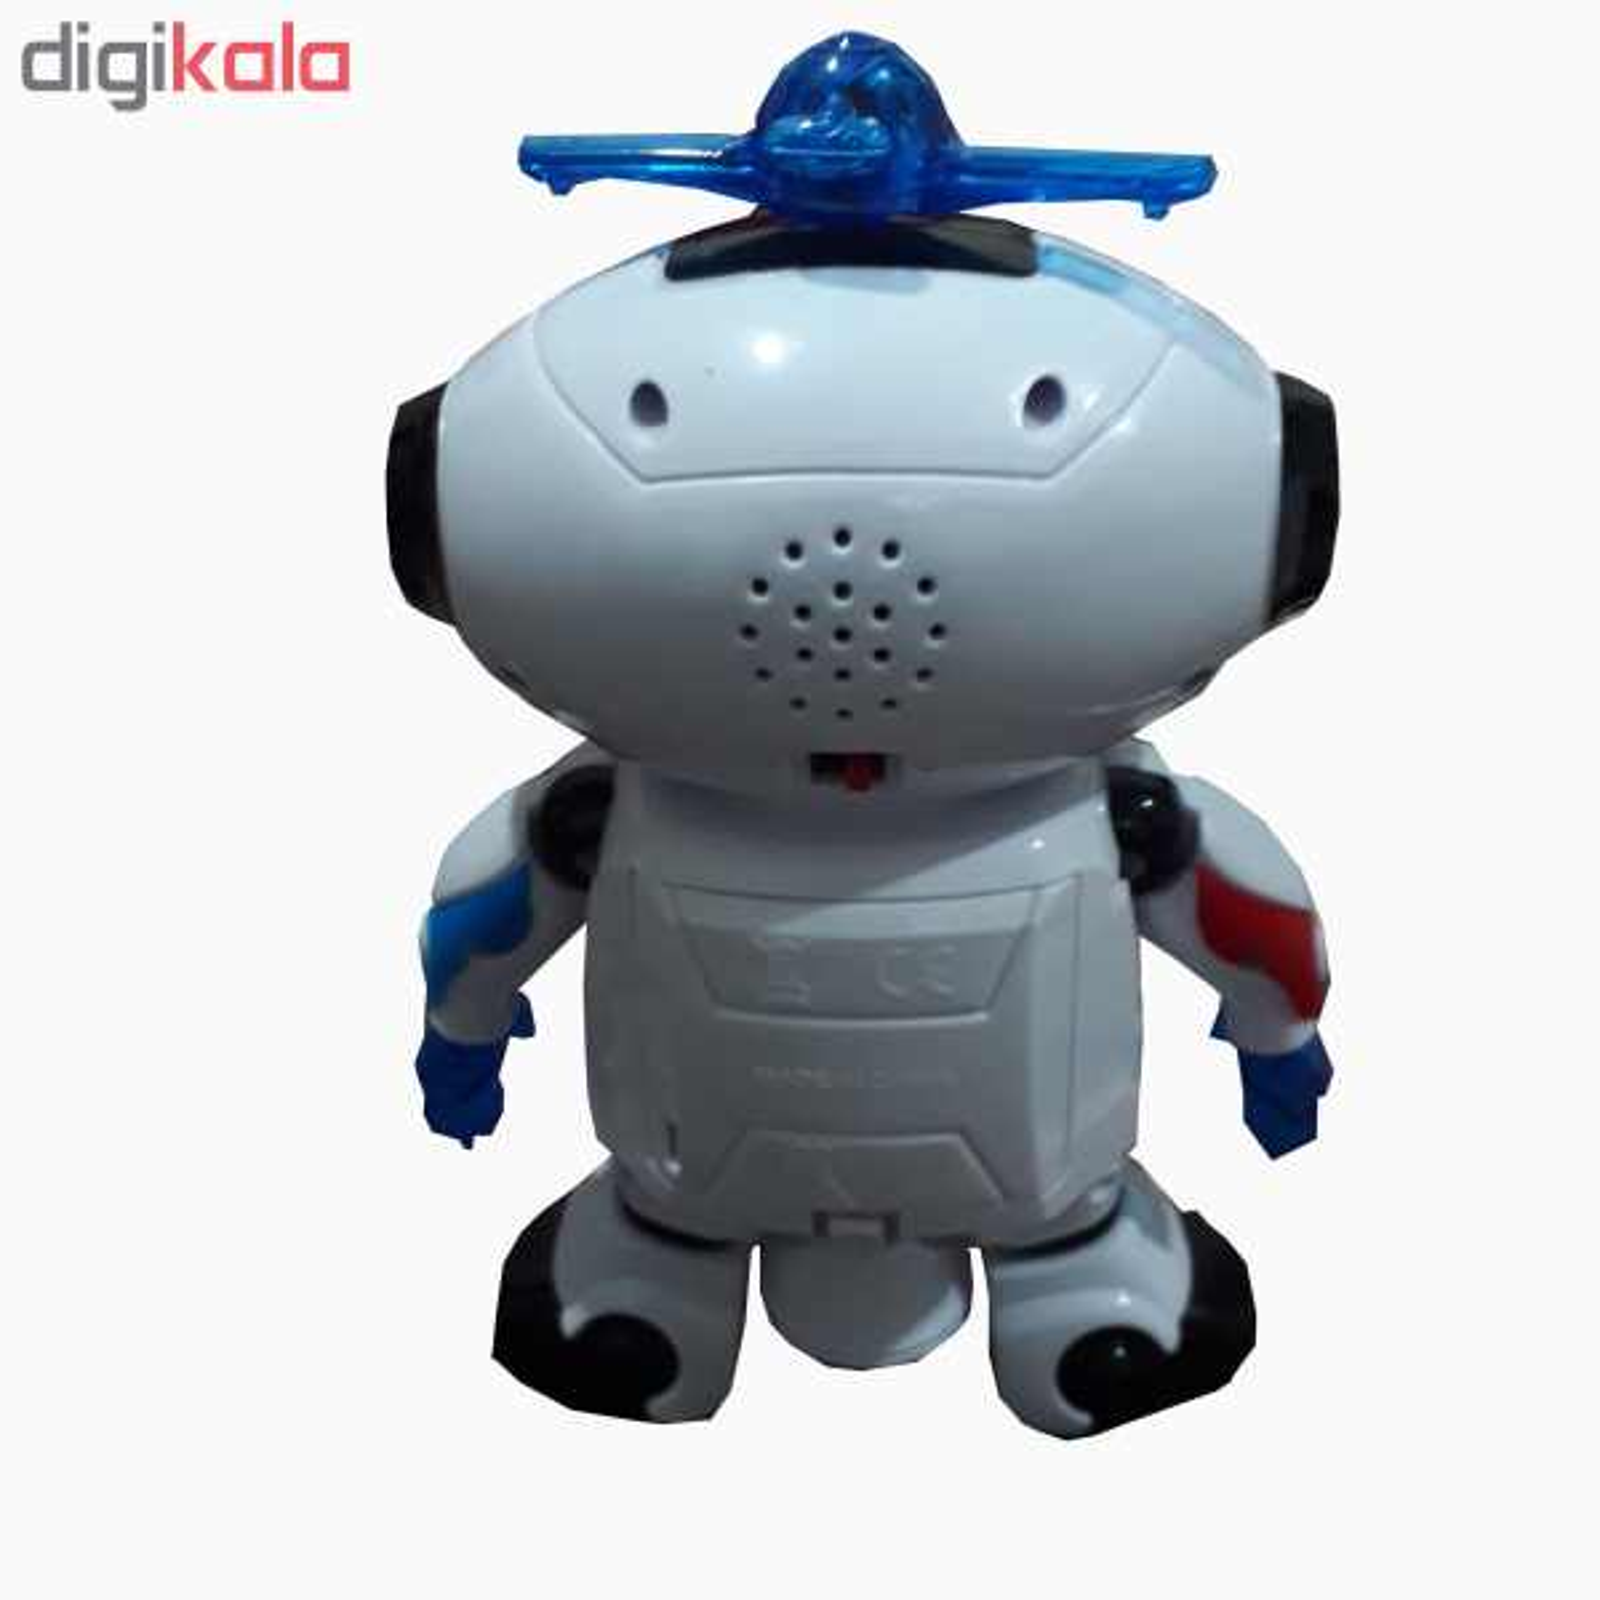 ربات مدل 09 کد 2865